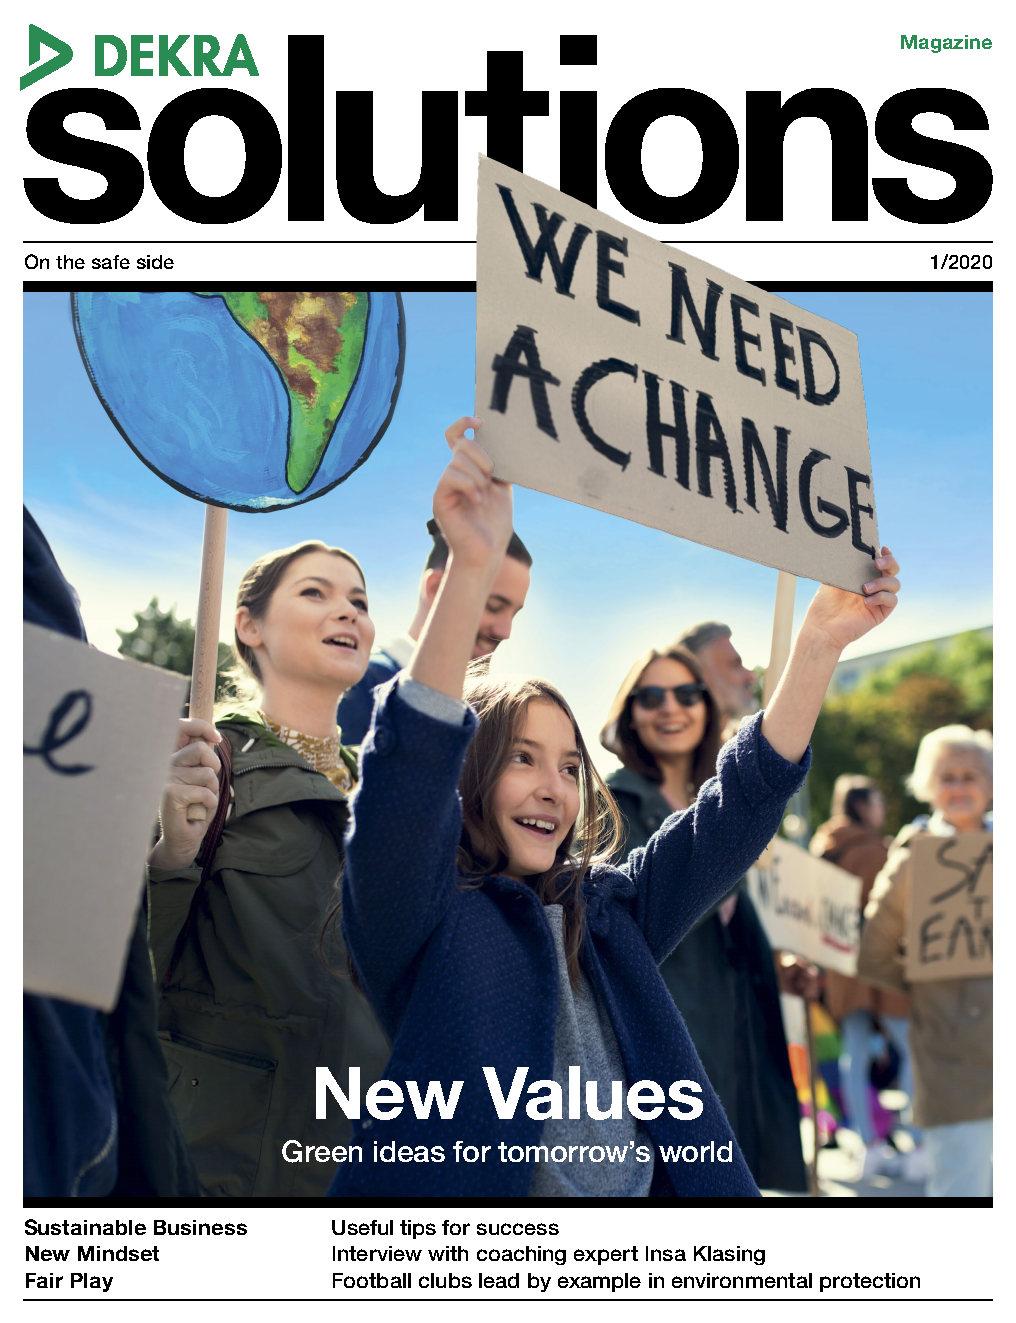 DEKRA solutions Magazine 1/2020